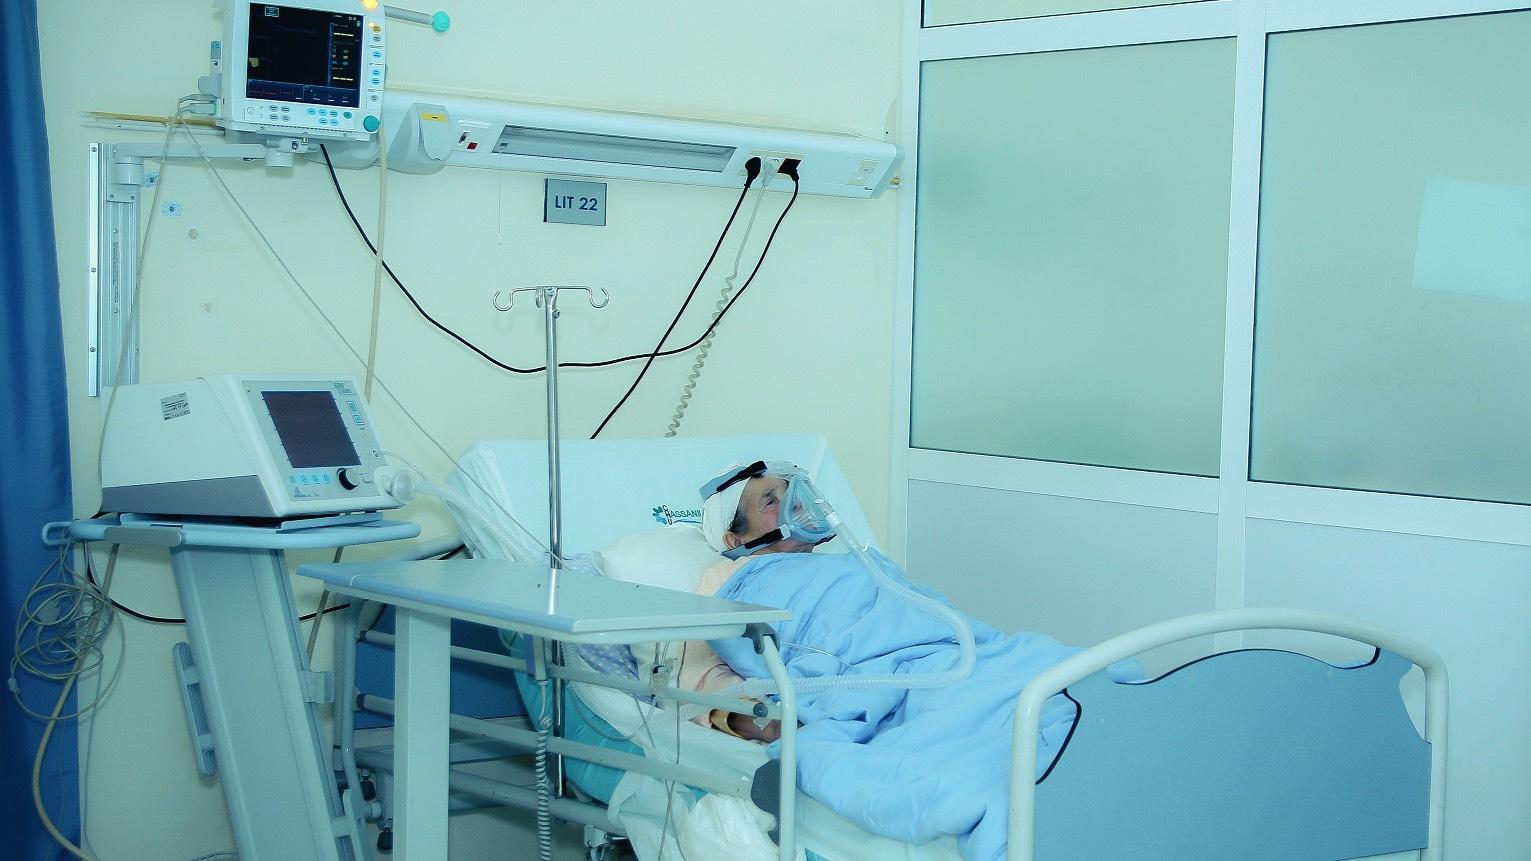 Unité de soins intensifs de Pneumologie (USIP)